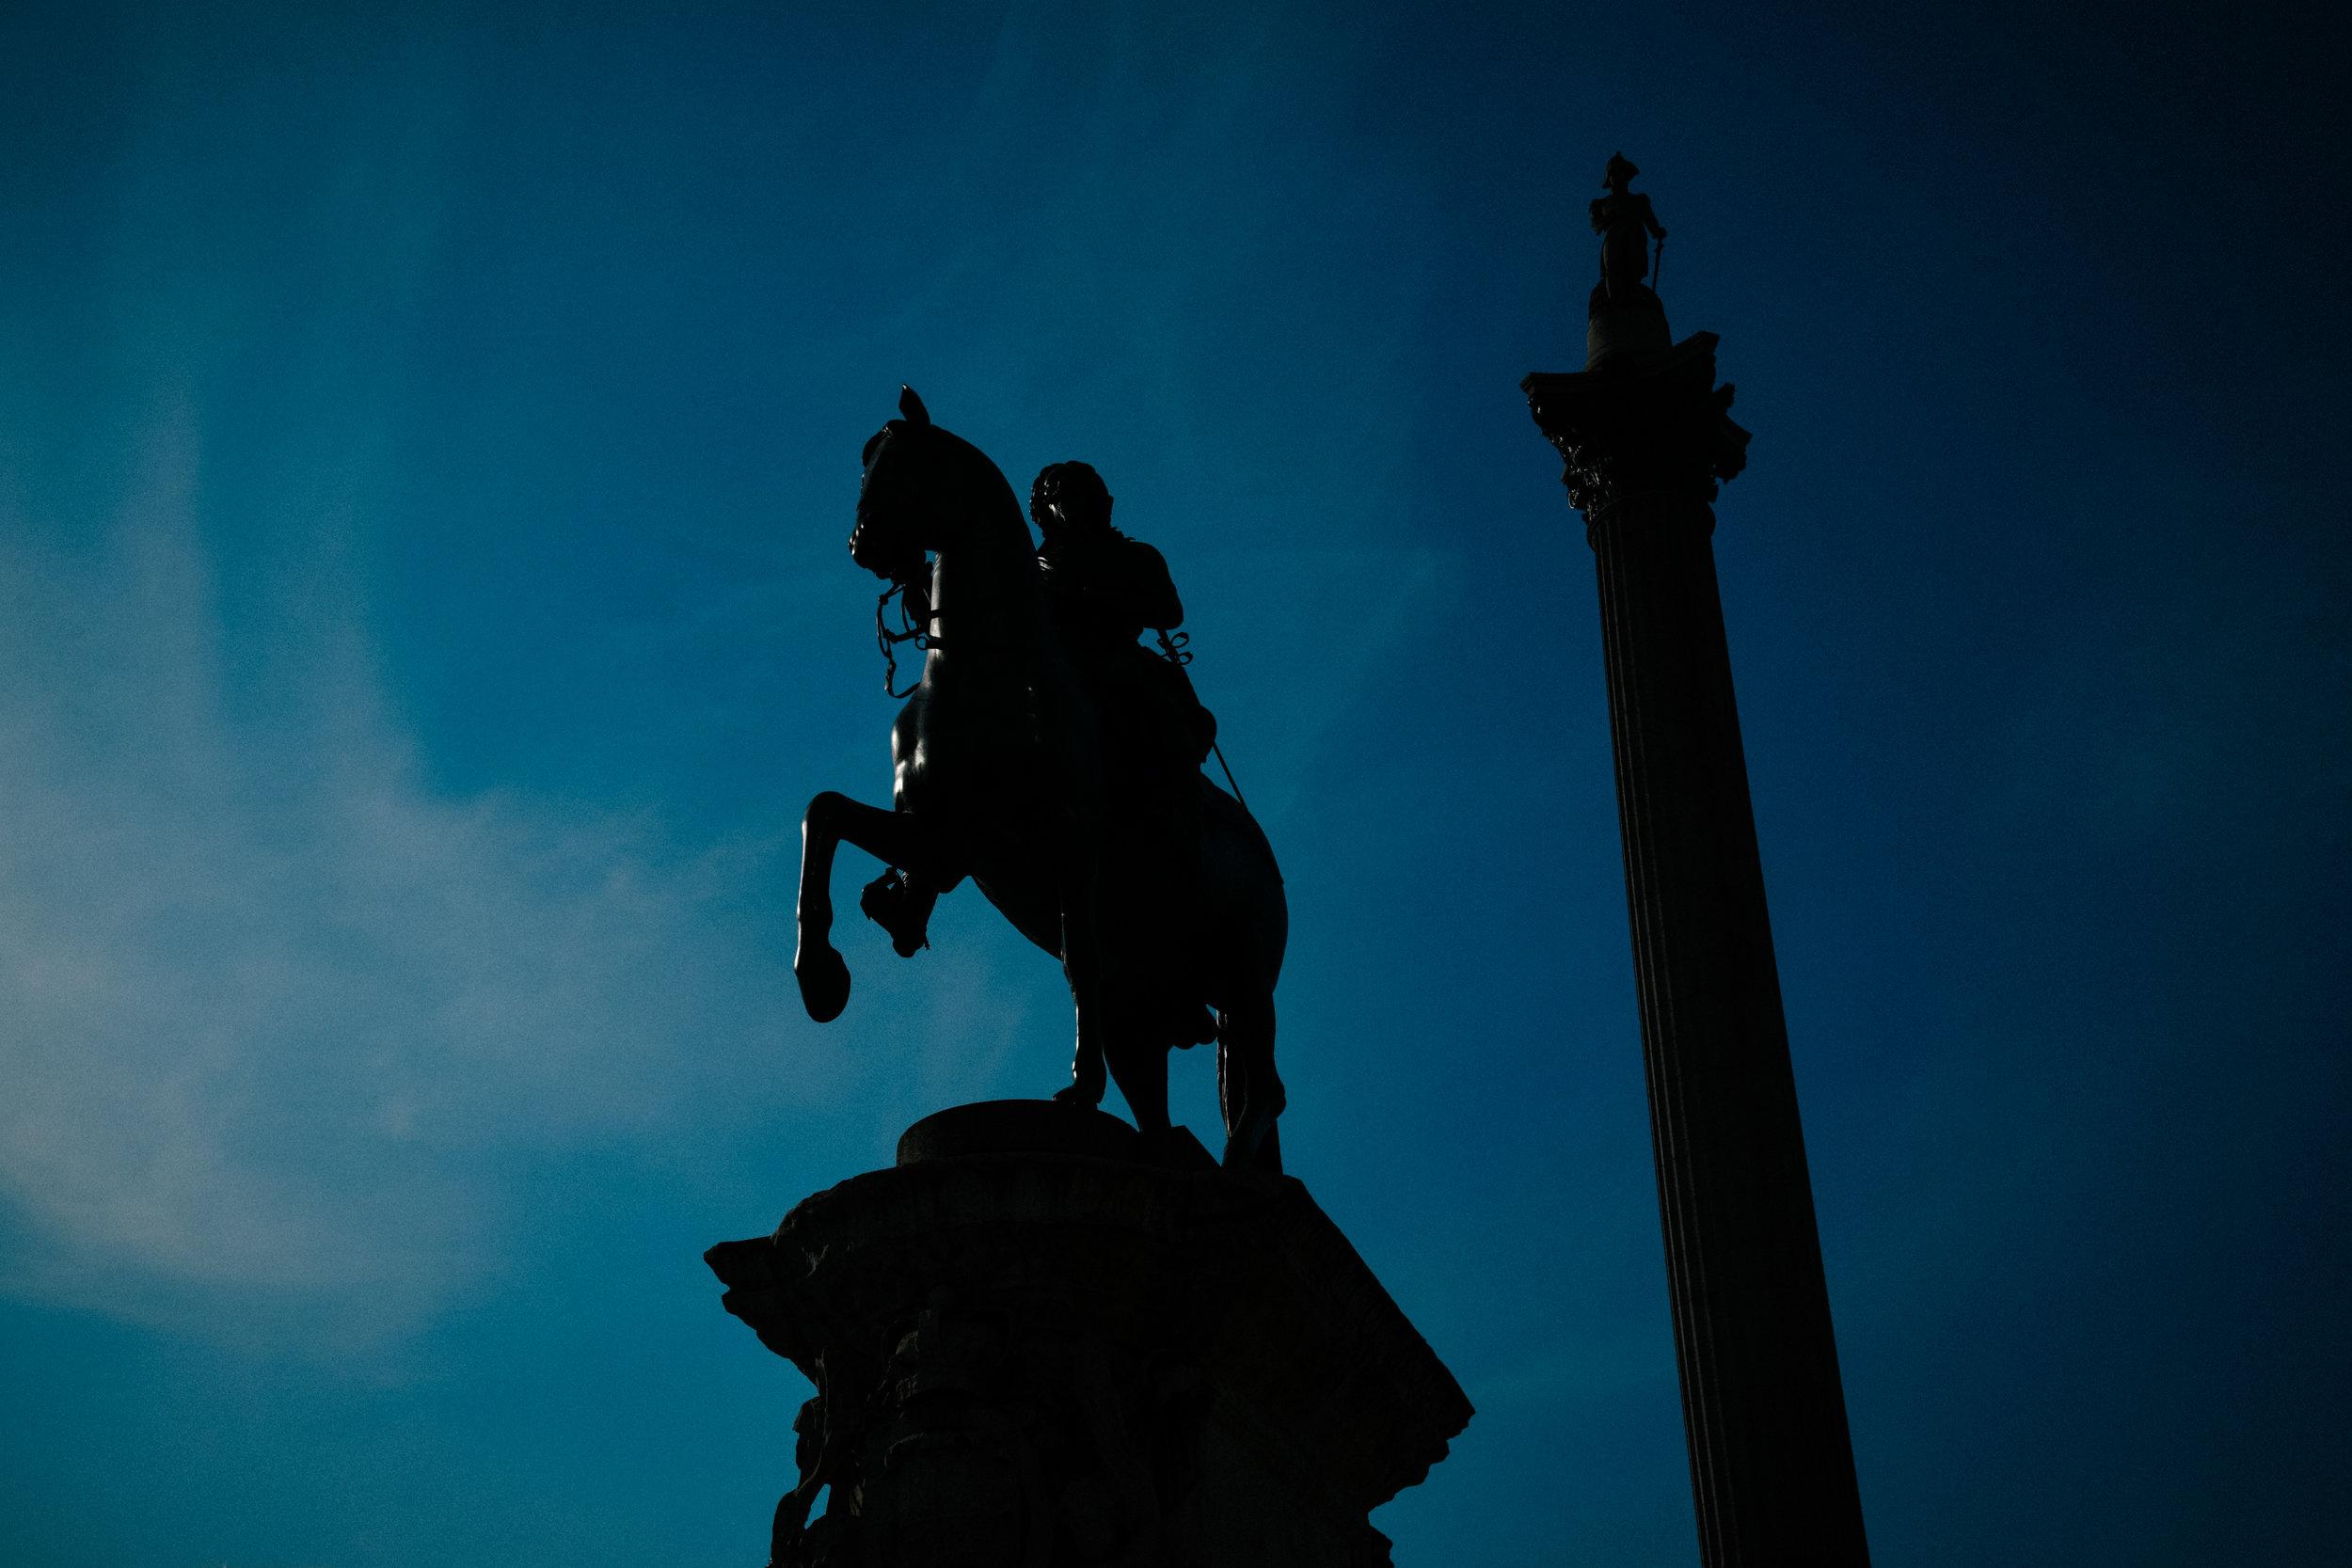 A statue near Trafalgar square